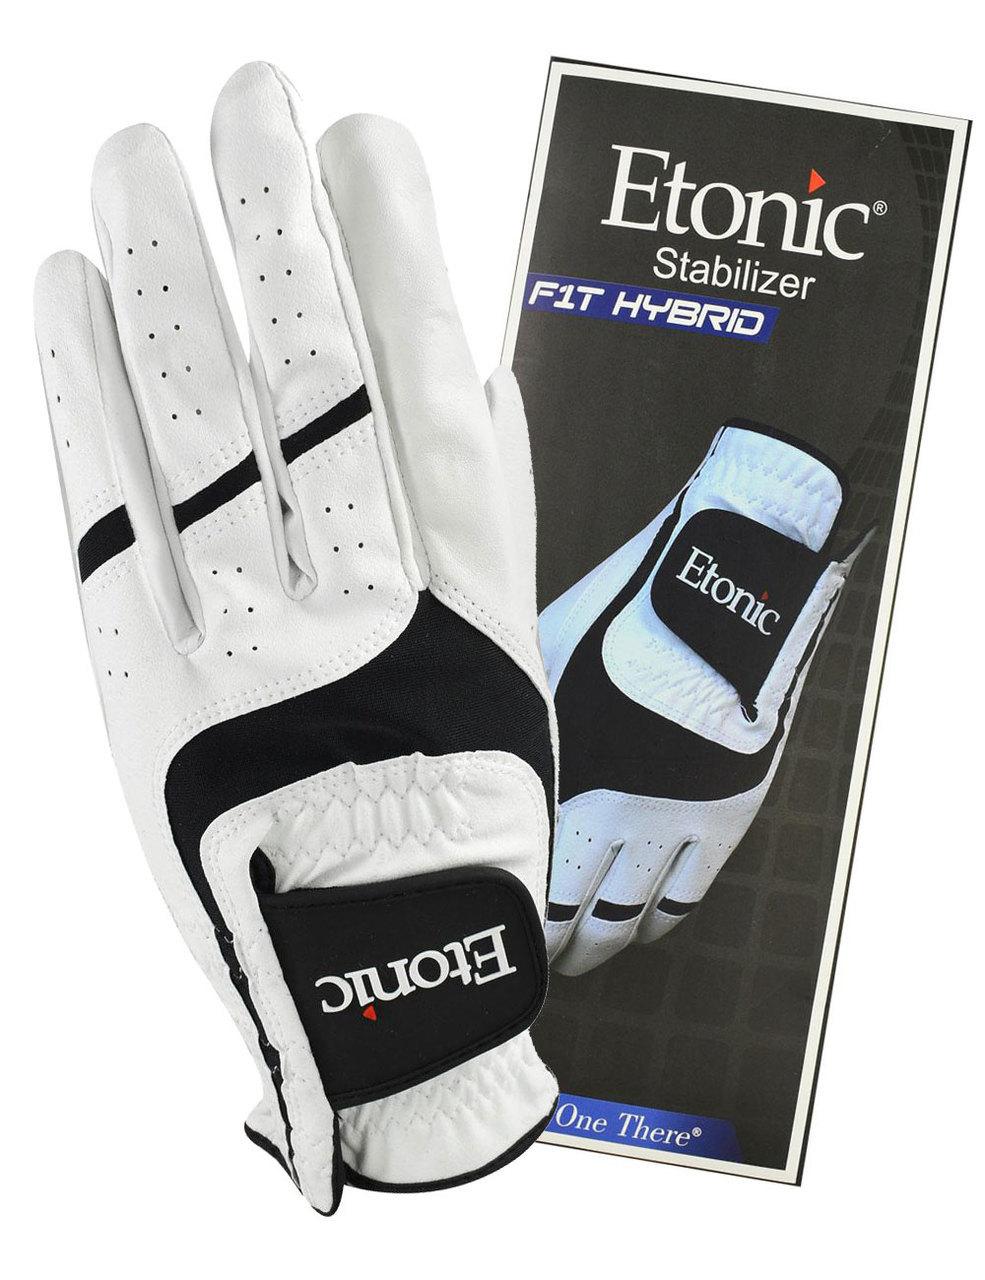 Etonic Golf MLH Stabilizer F1T Hybrid Glove